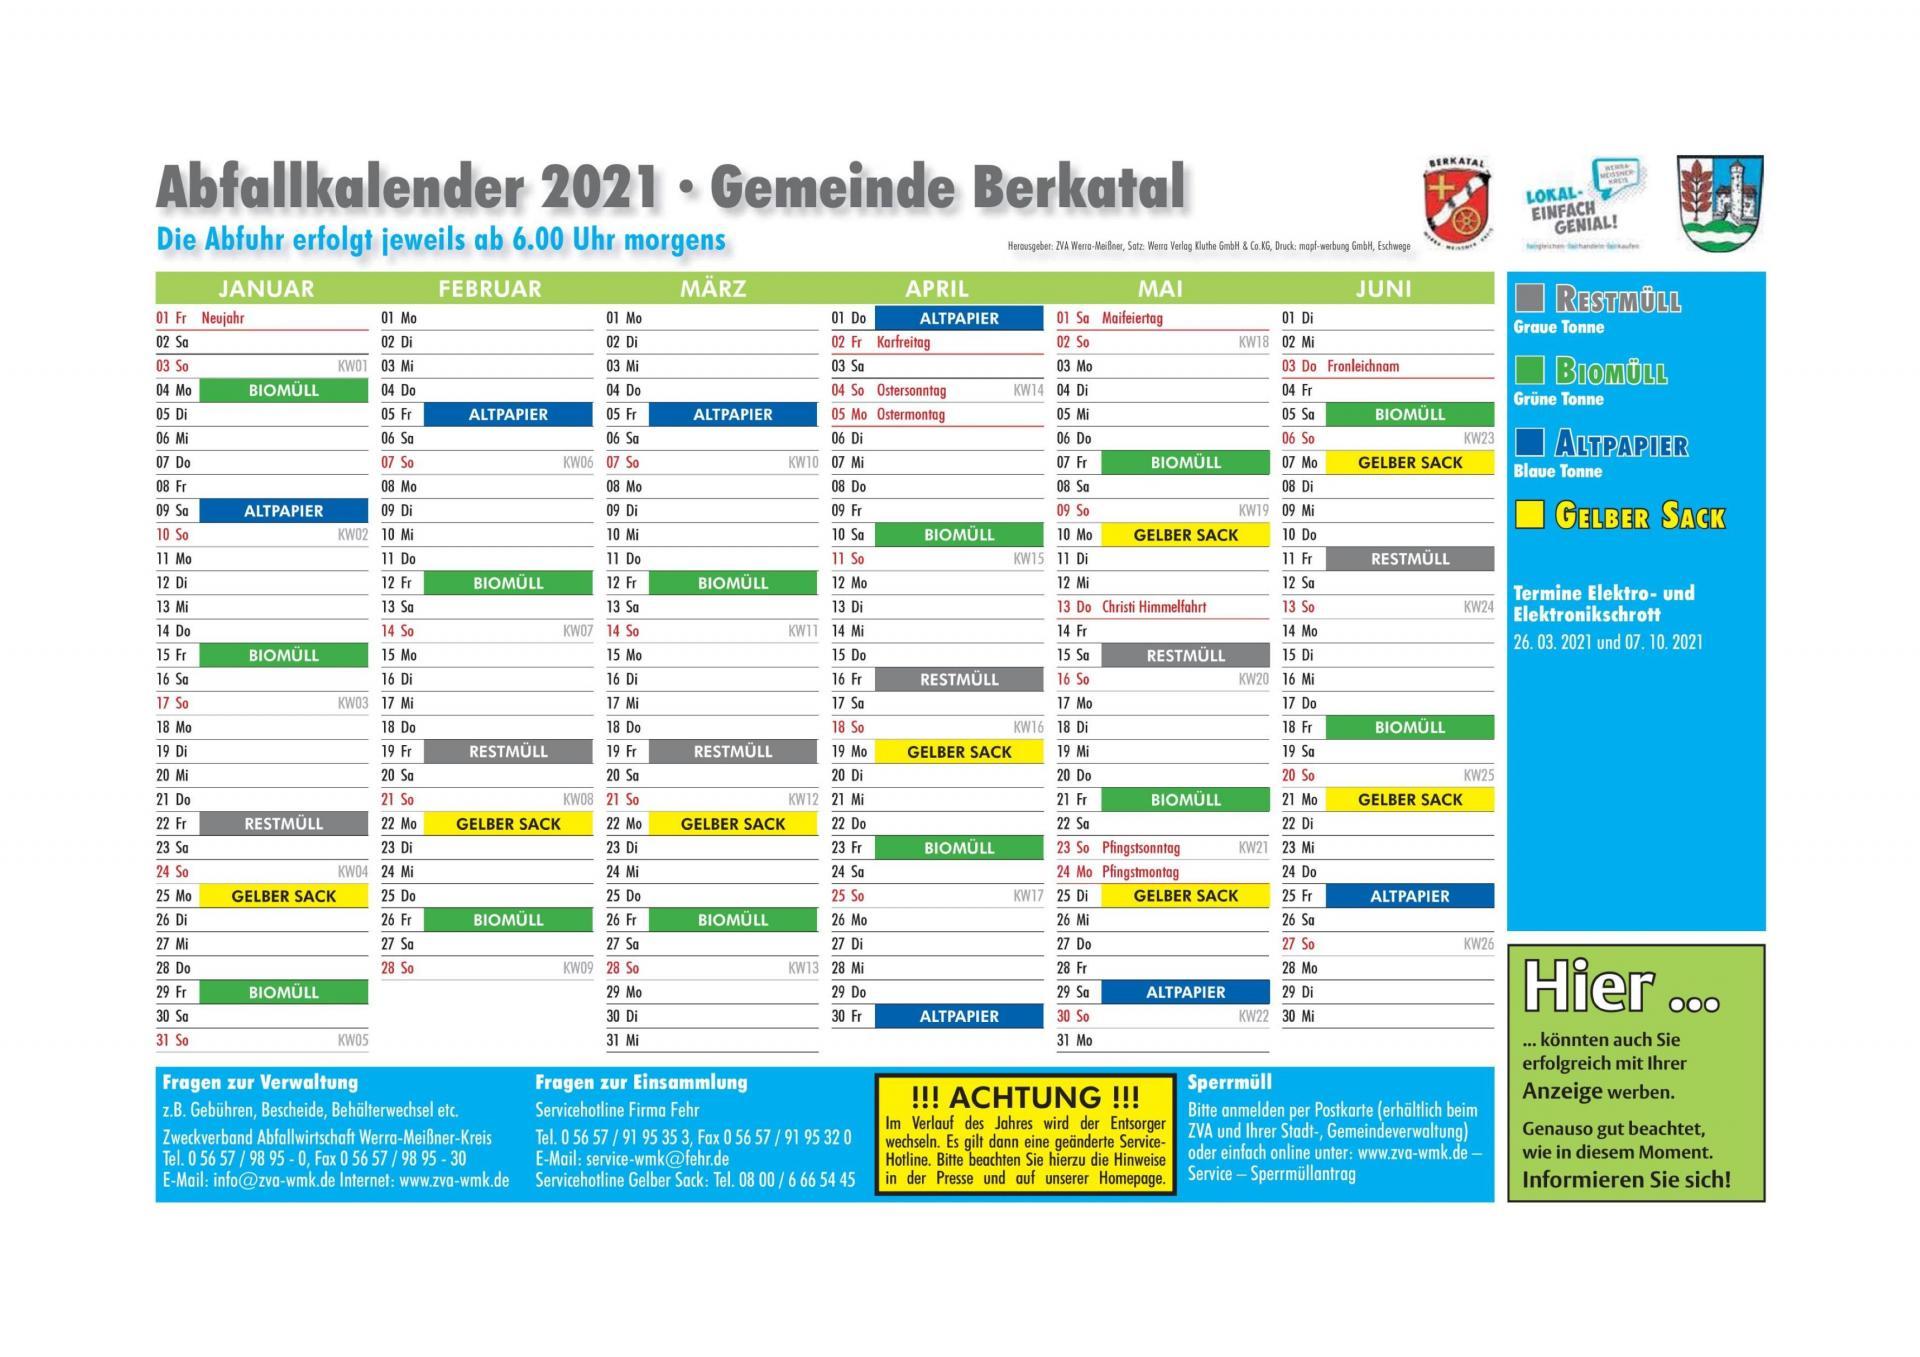 Abfallkalender 2021 1. Halbjahr.jpg